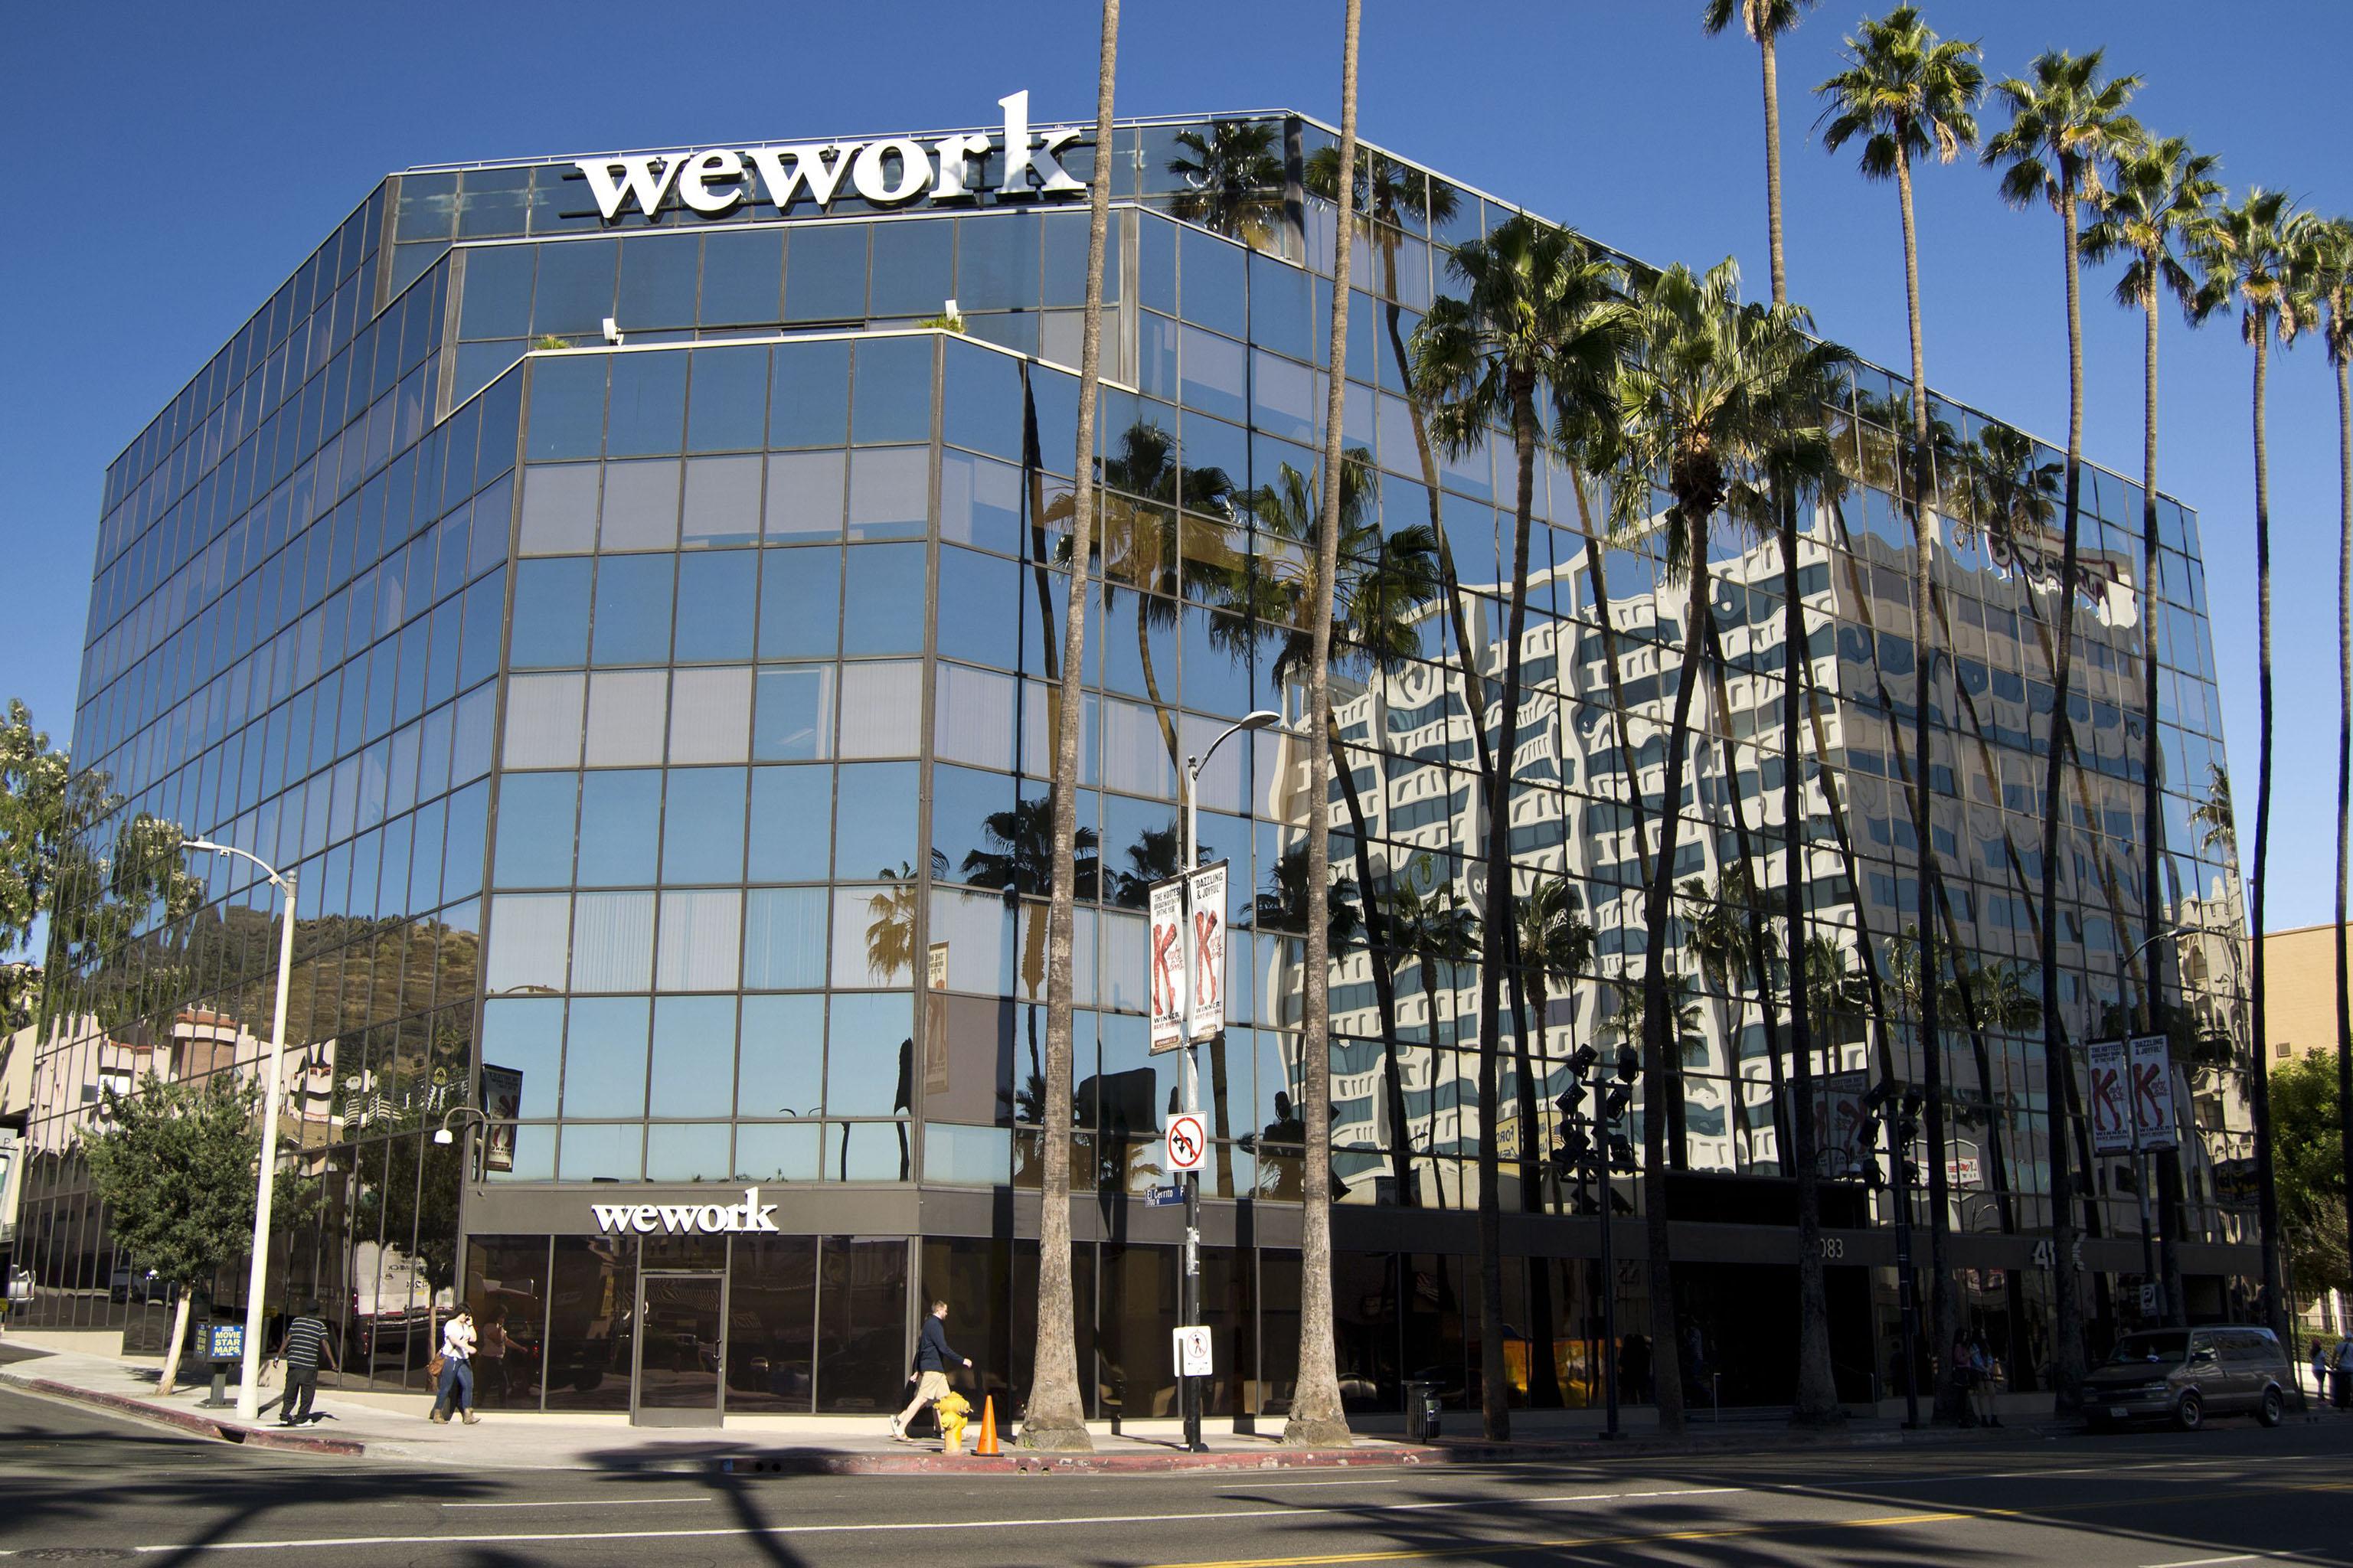 Wework on Sunset, Los Angeles.